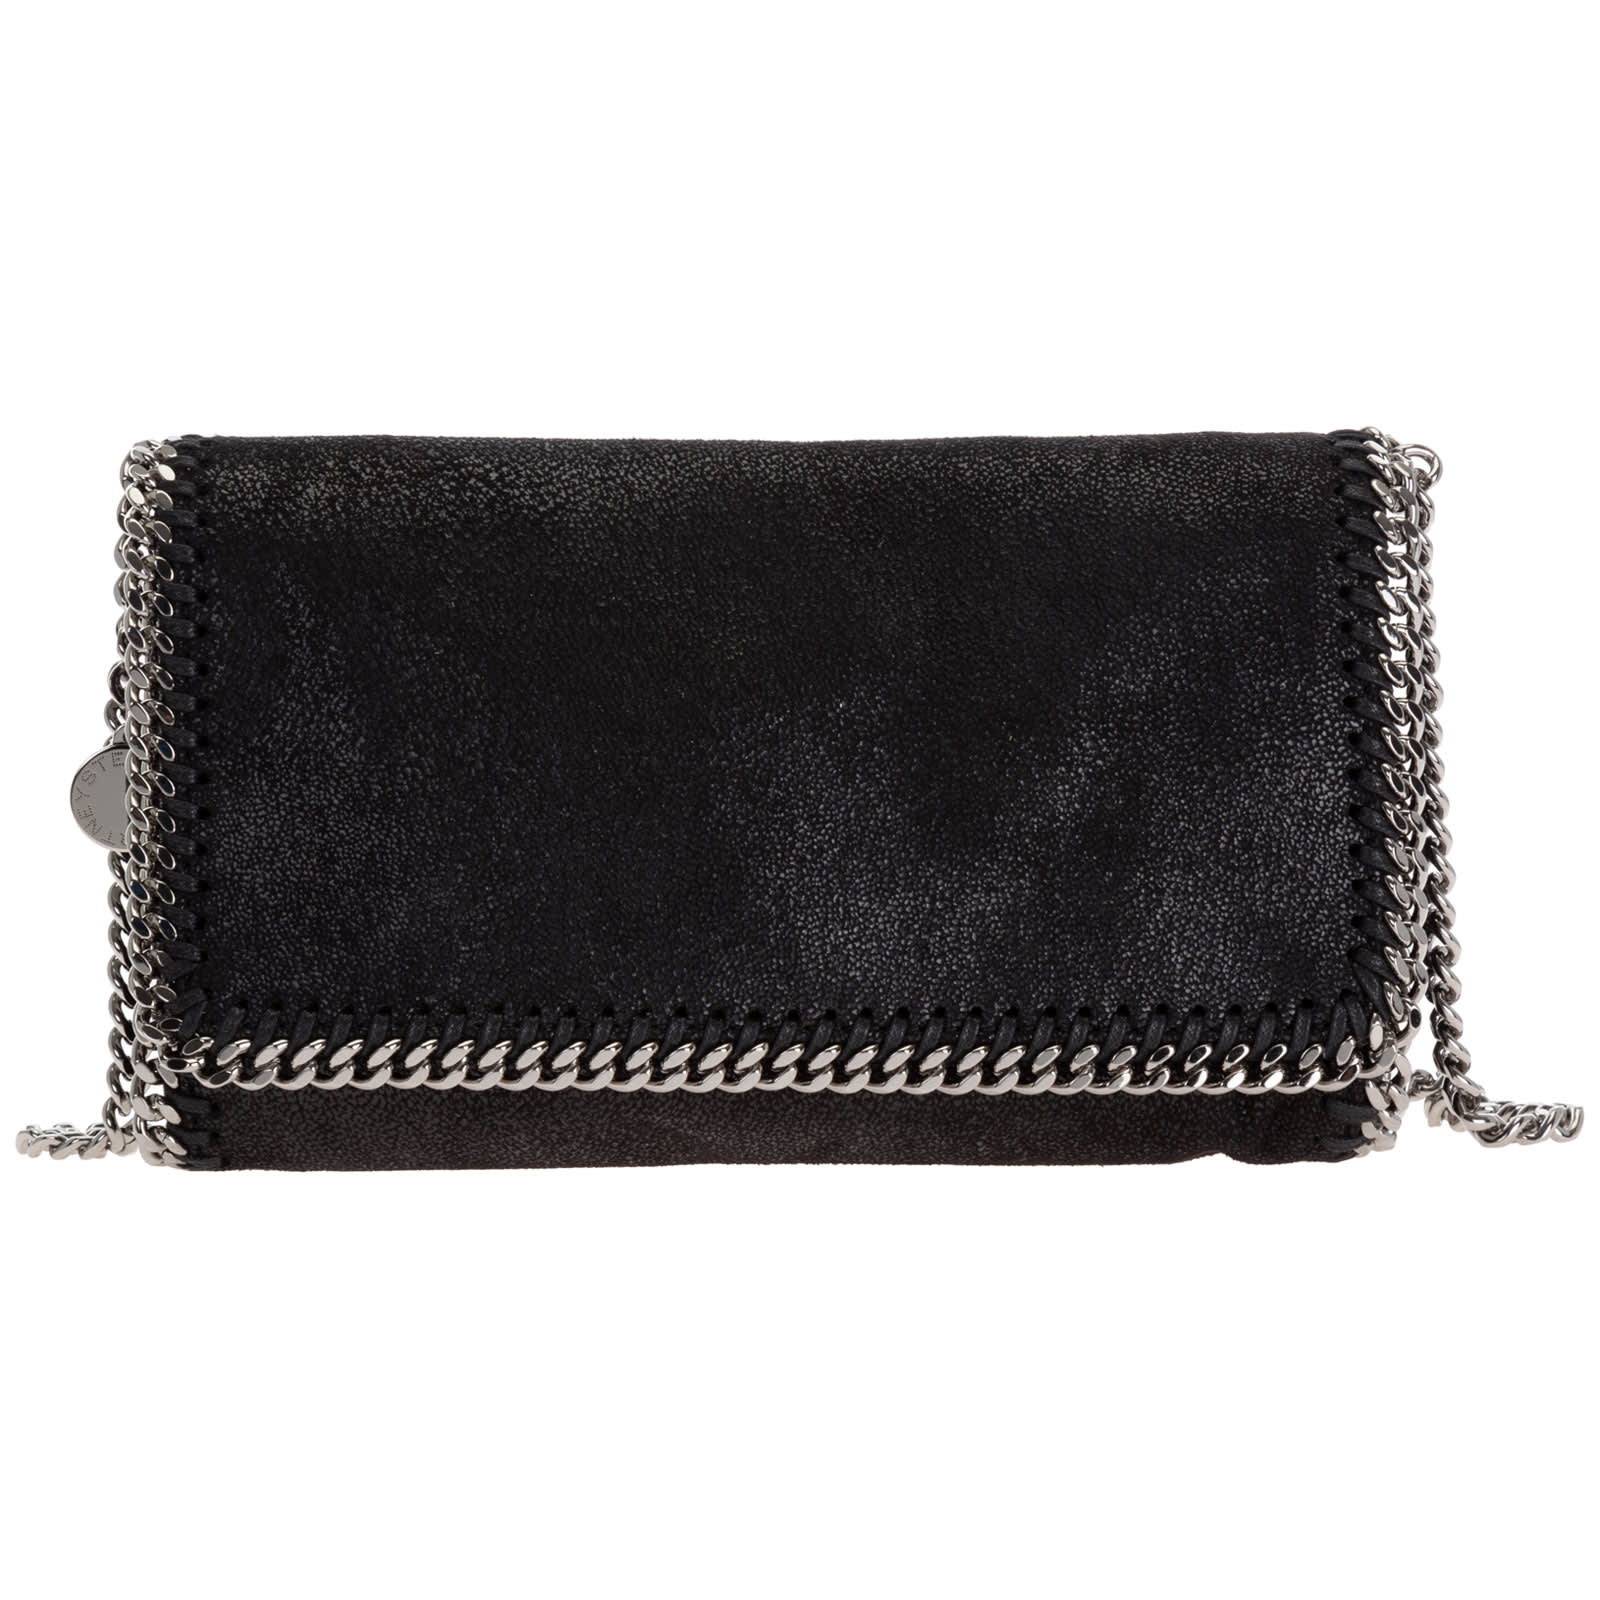 Stella Mccartney Falabella Crossbody Bags In Nero